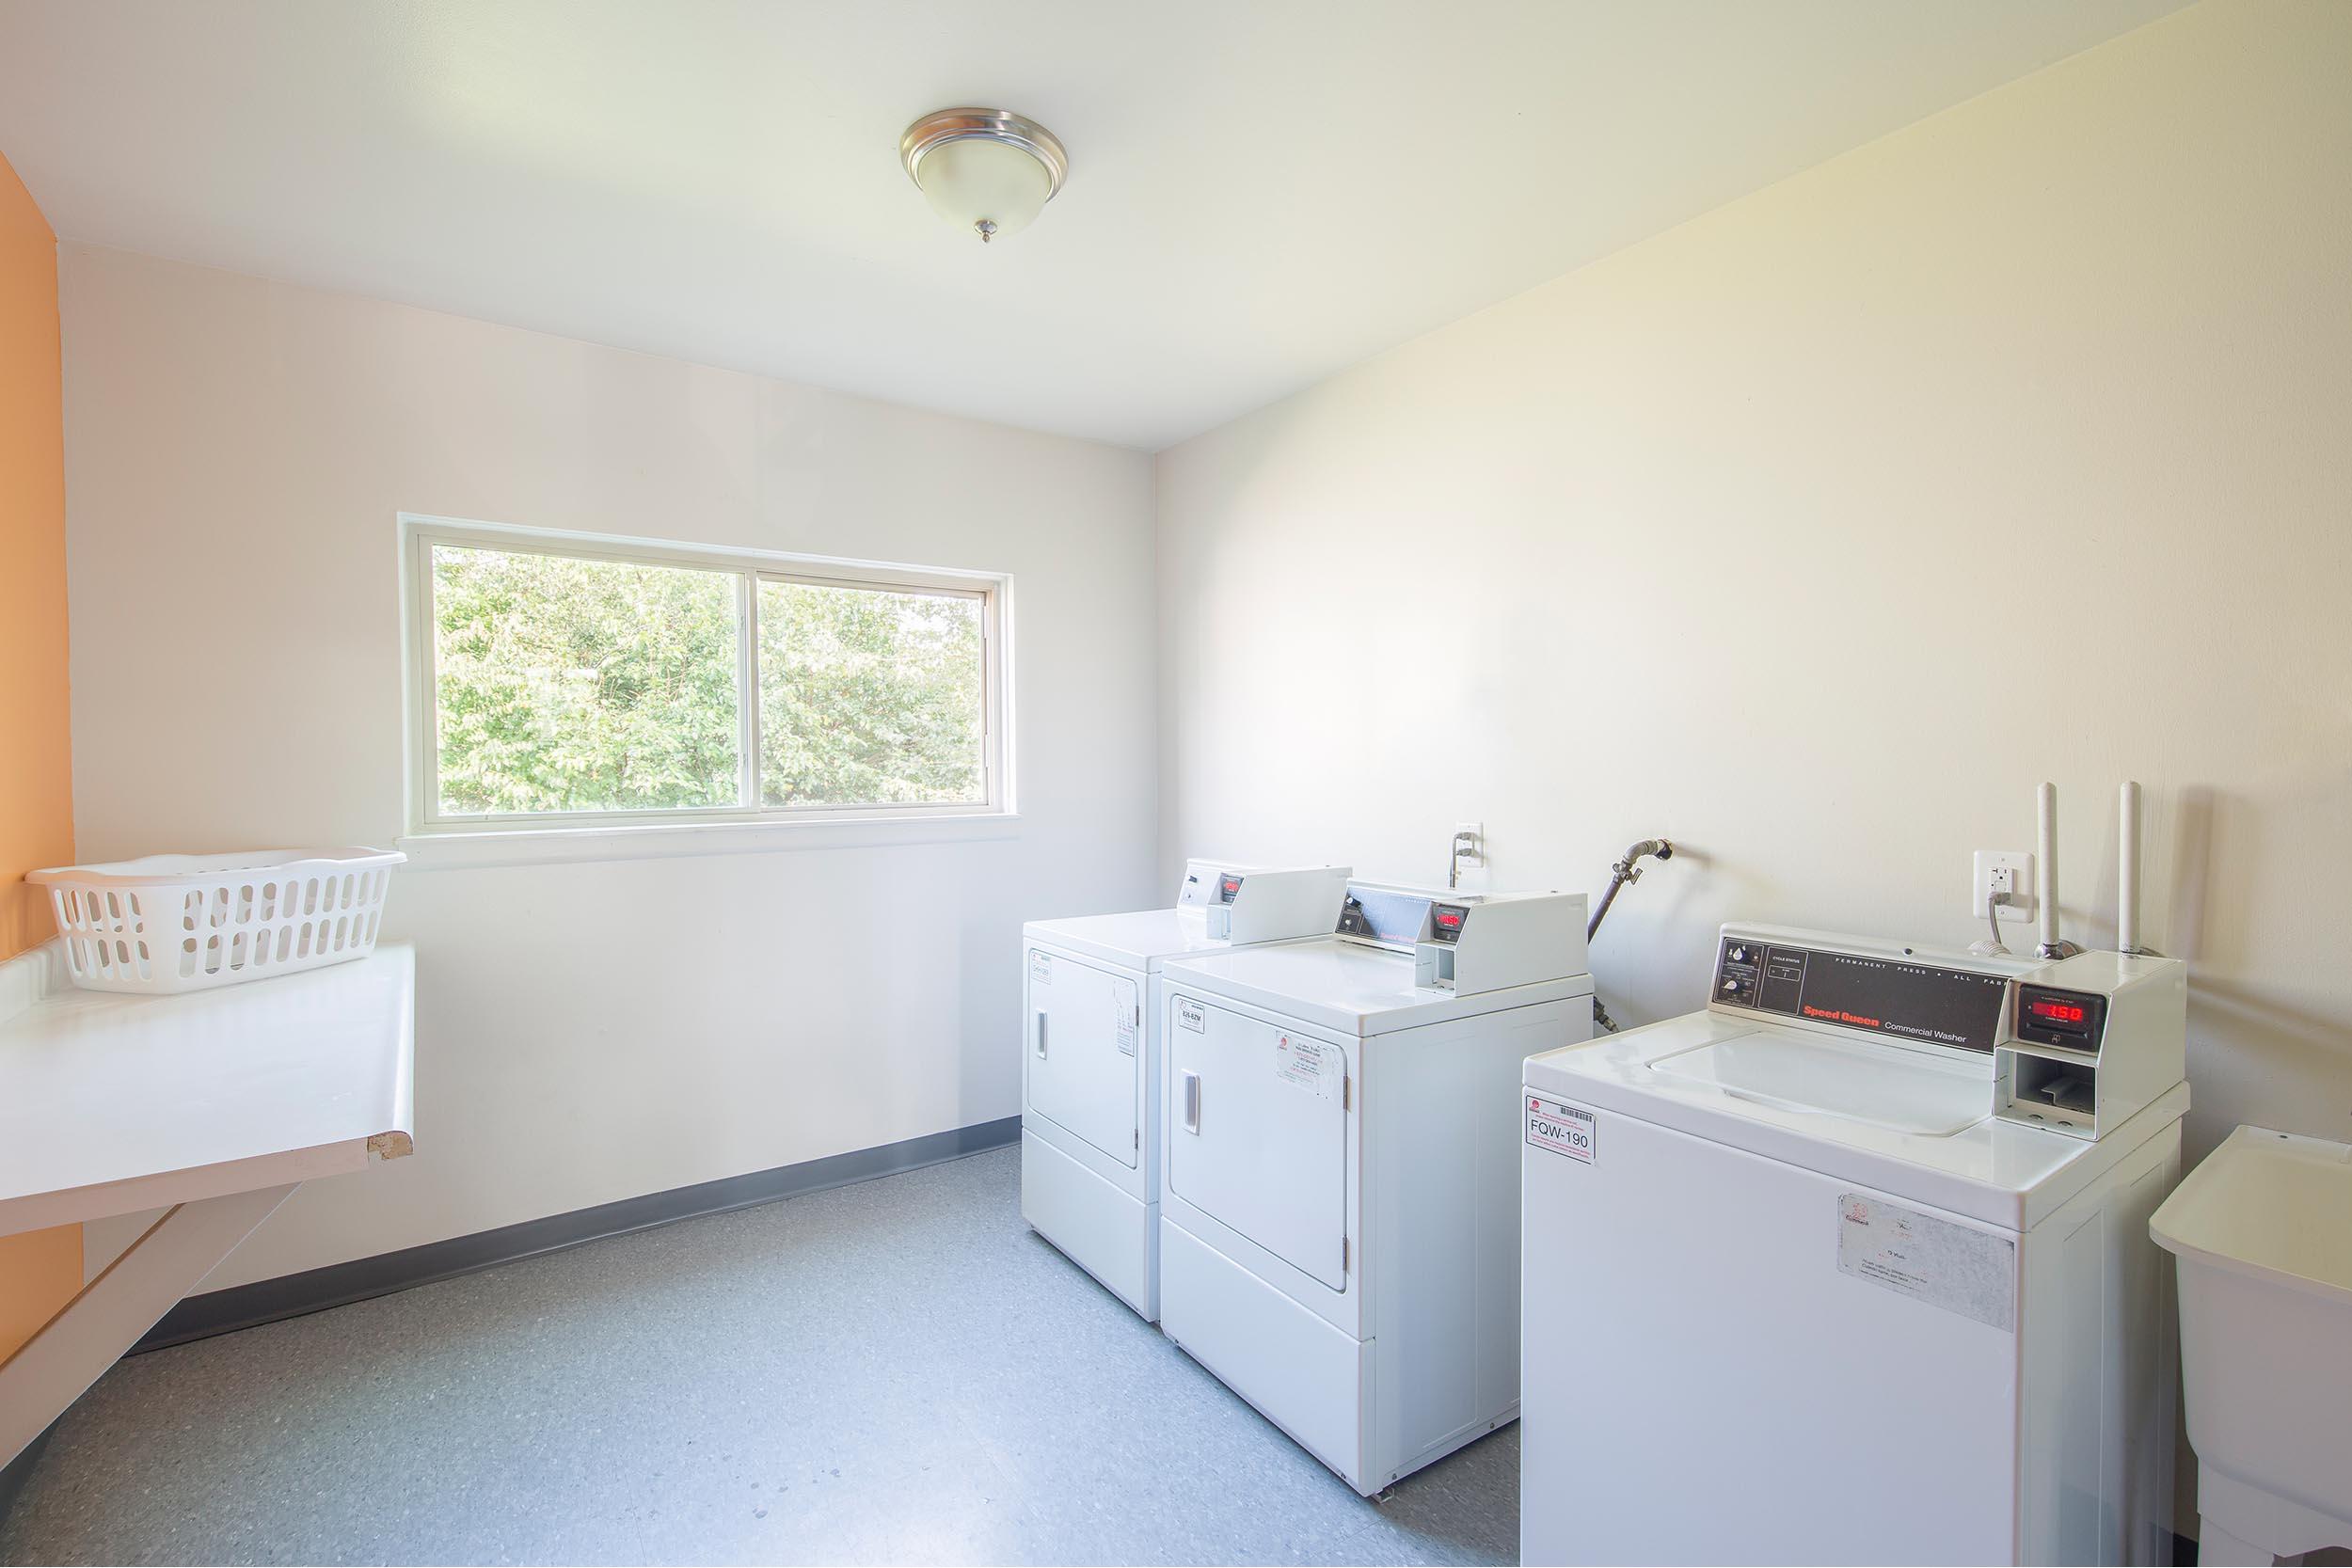 Rt-20laundry-20center-202